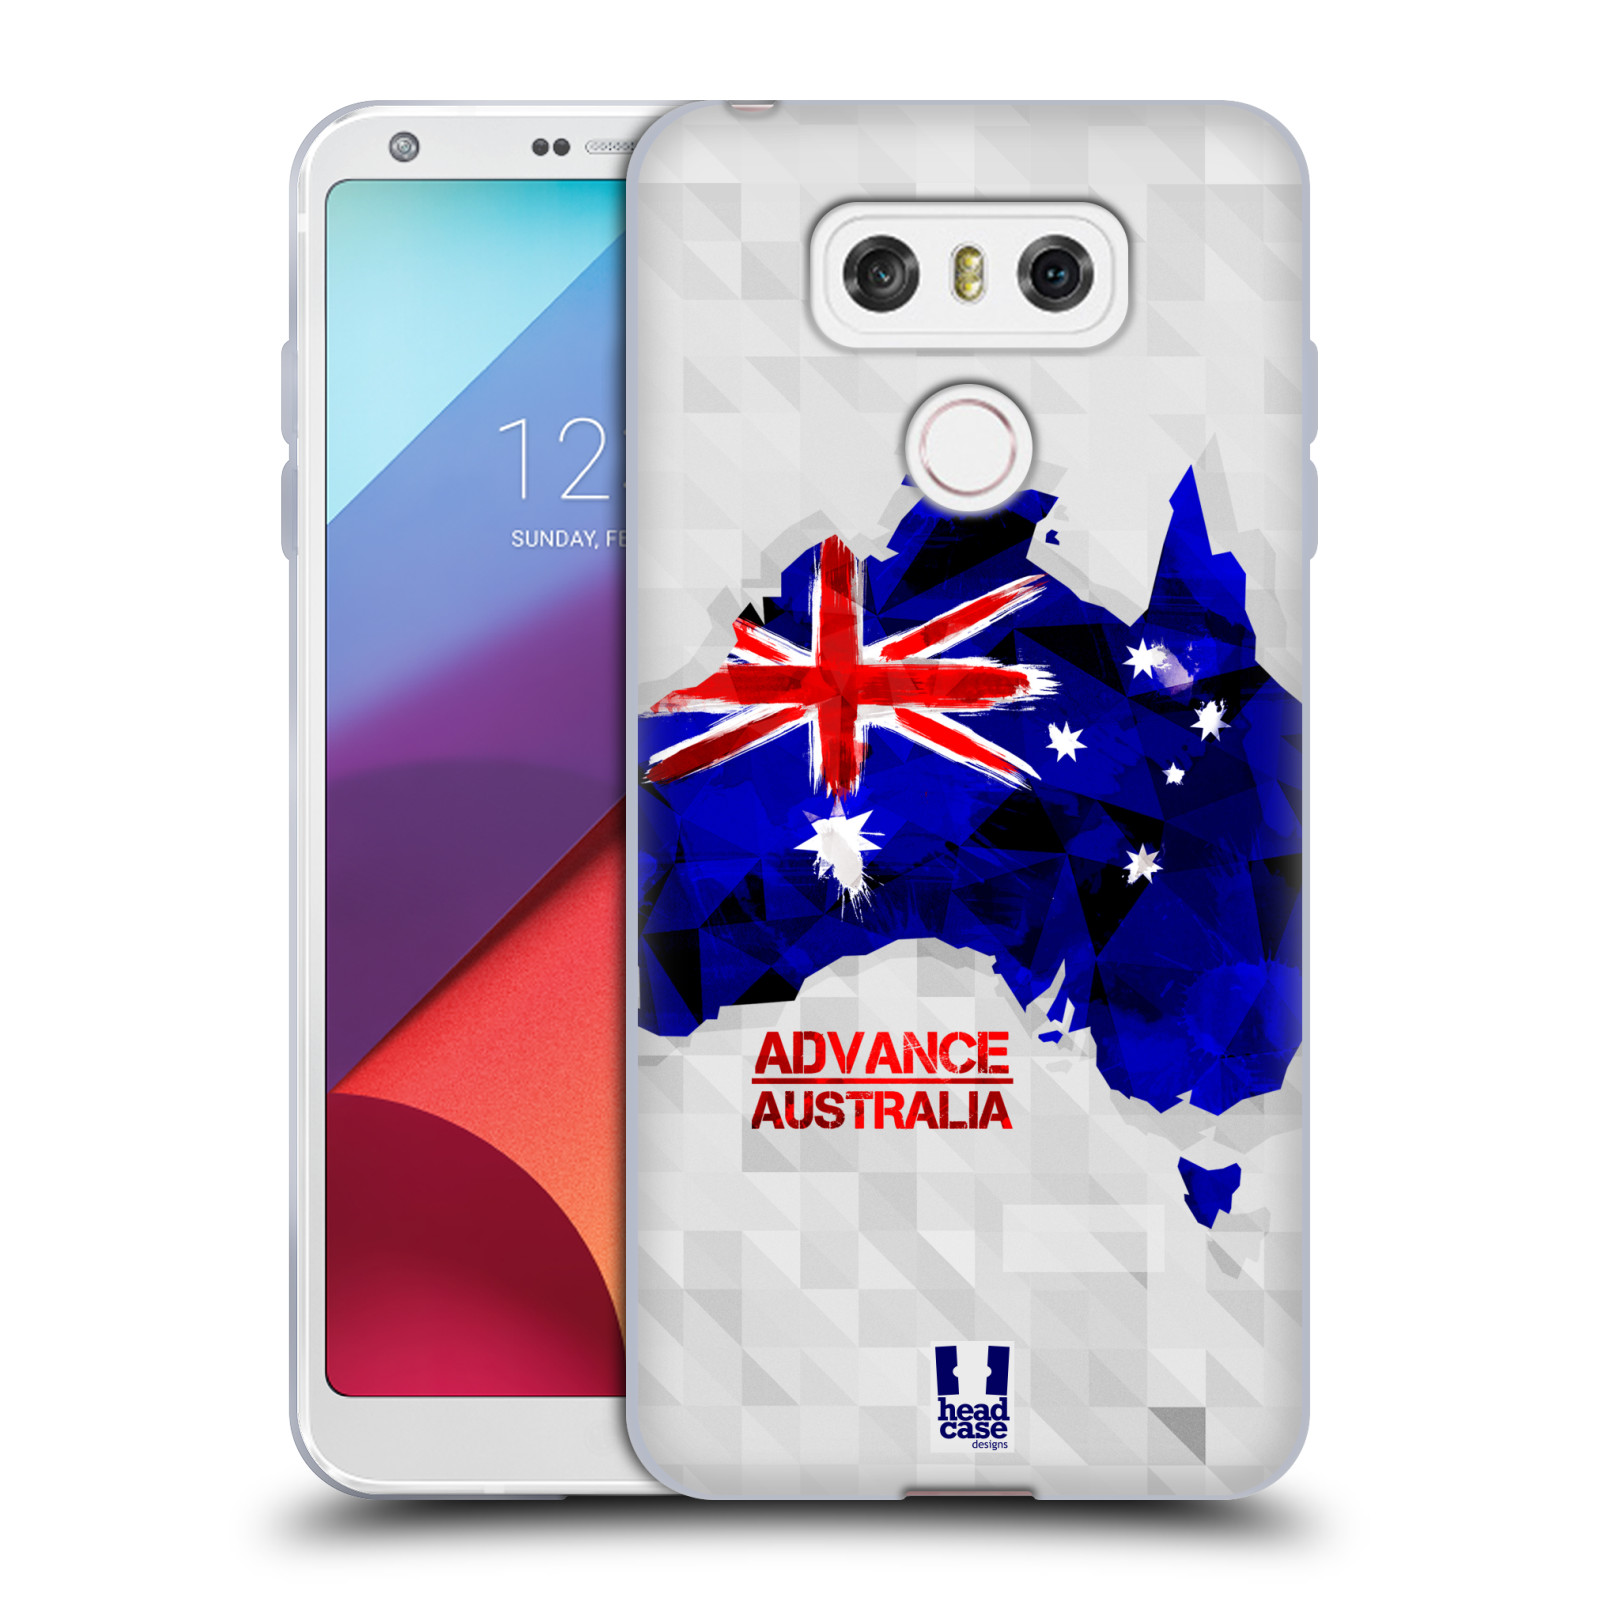 Silikonové pouzdro na mobil LG G6 - Head Case GEOMAPA AUSTRÁLIE (Silikonový kryt či obal na mobilní telefon LG G6 H870 / LG G6 Dual SIM H870DS)